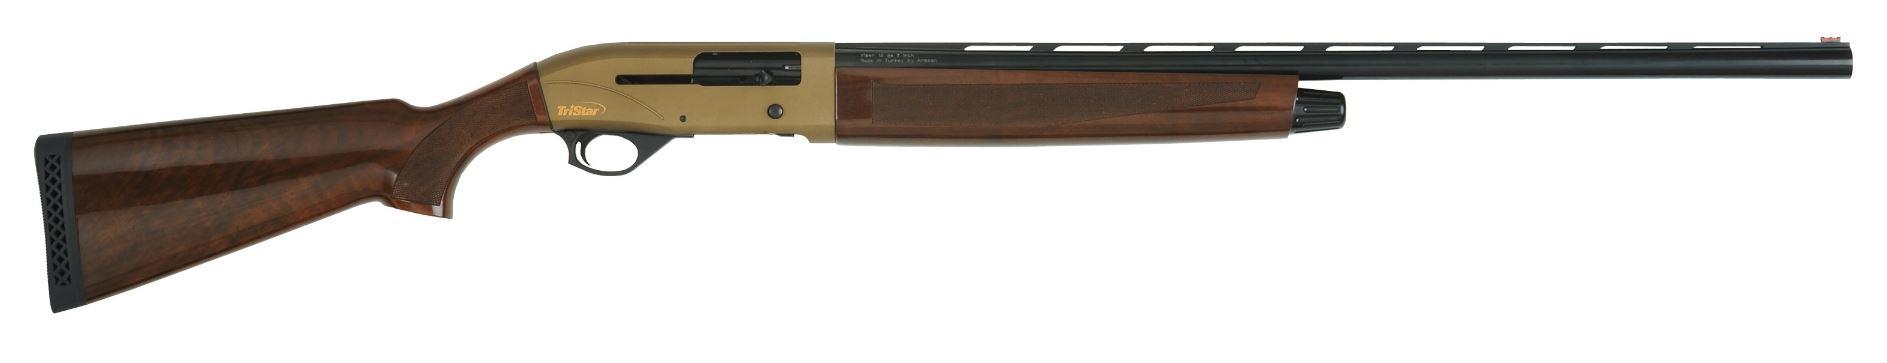 TriStar Sporting Arms Viper G2 Bronze 12 Gauge